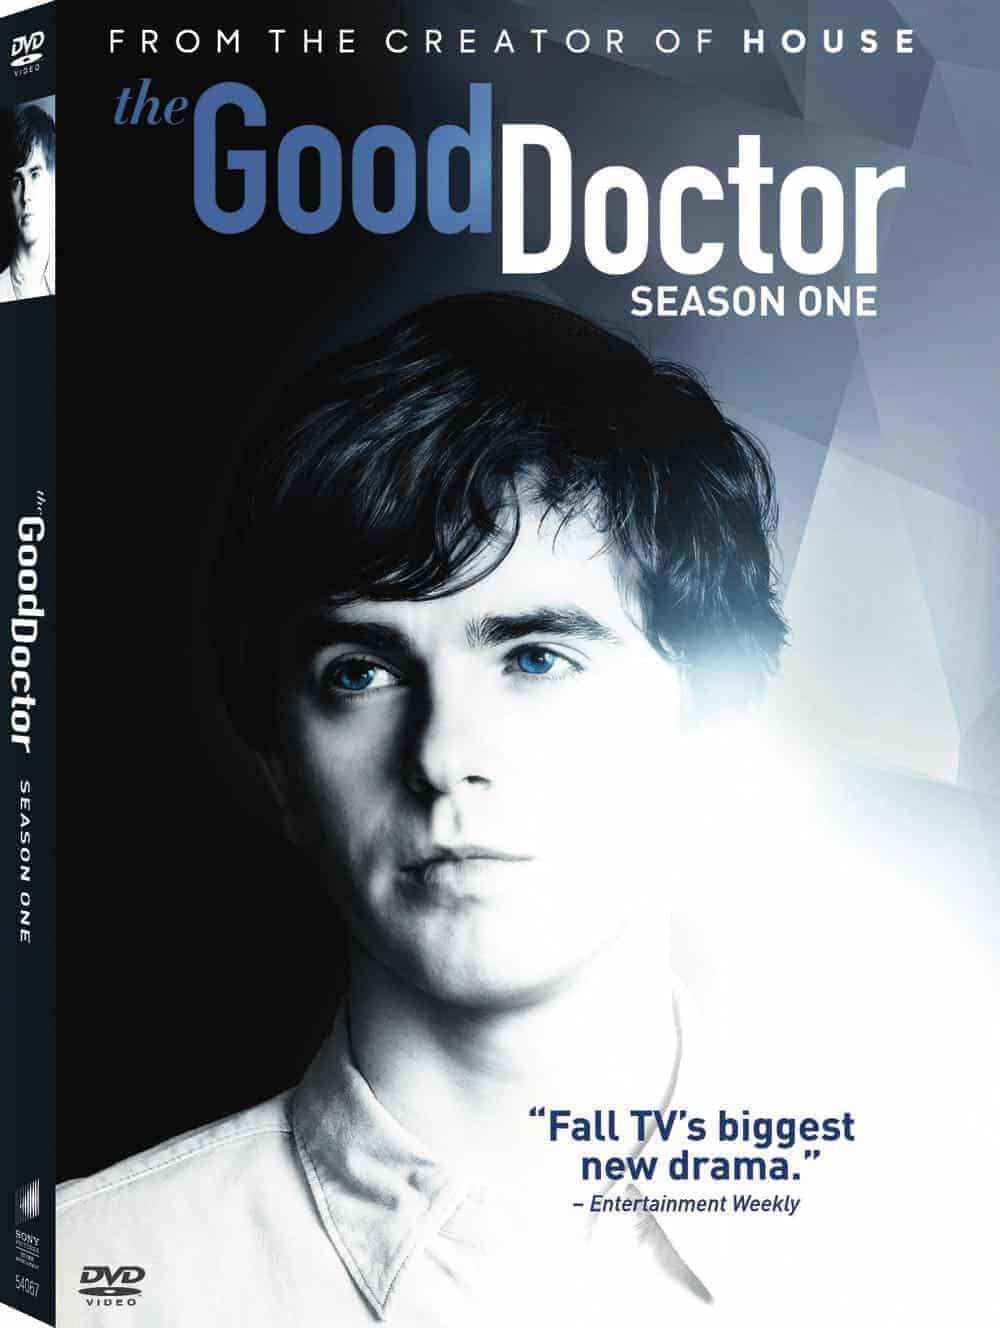 The Good Doctor Season 1 DVD